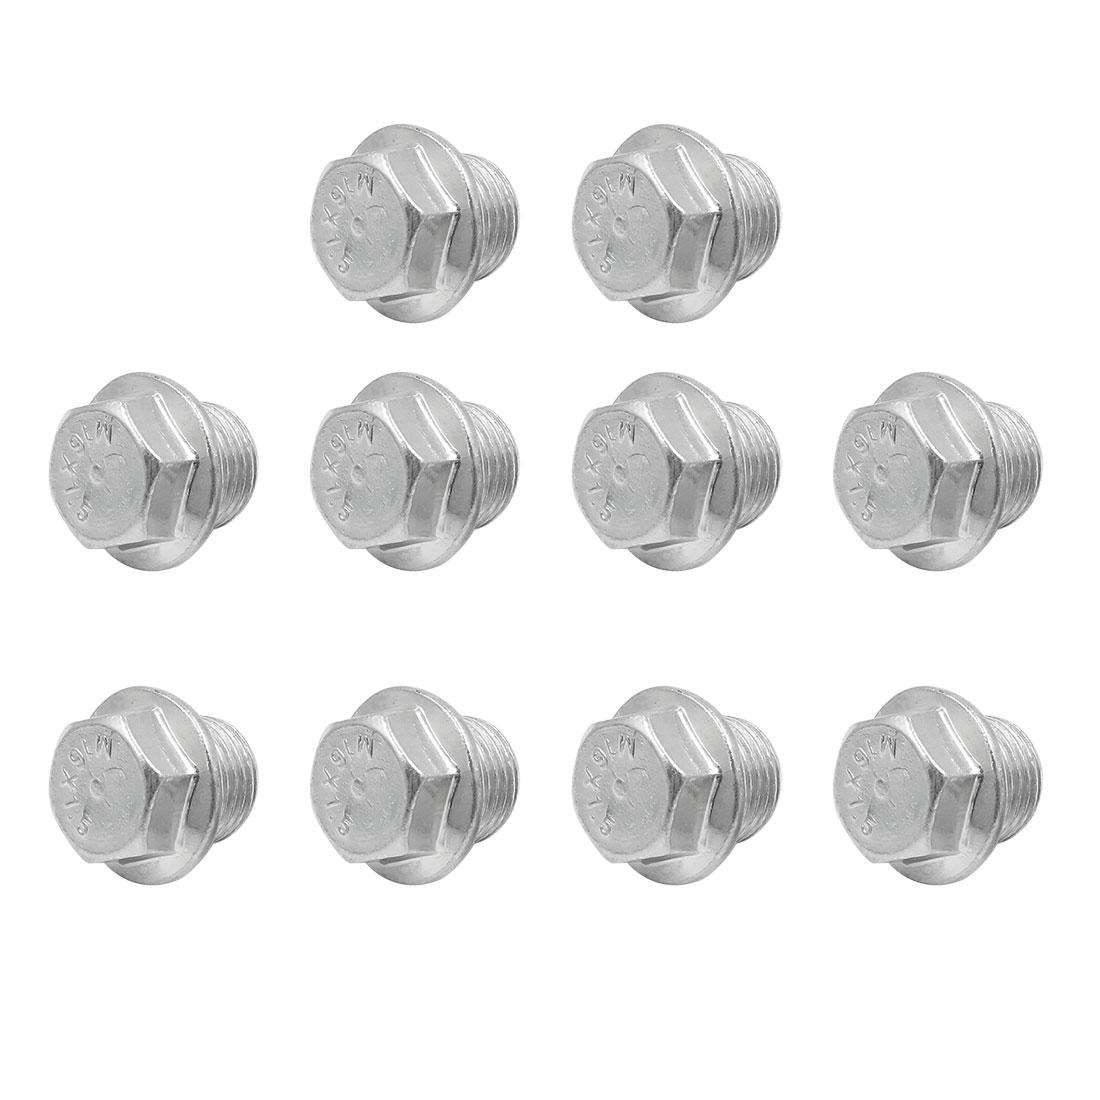 10pcs 24 x 21.5mm Car Silver Tone Magnetic Engine Oil Pan Drain Plug Bolt